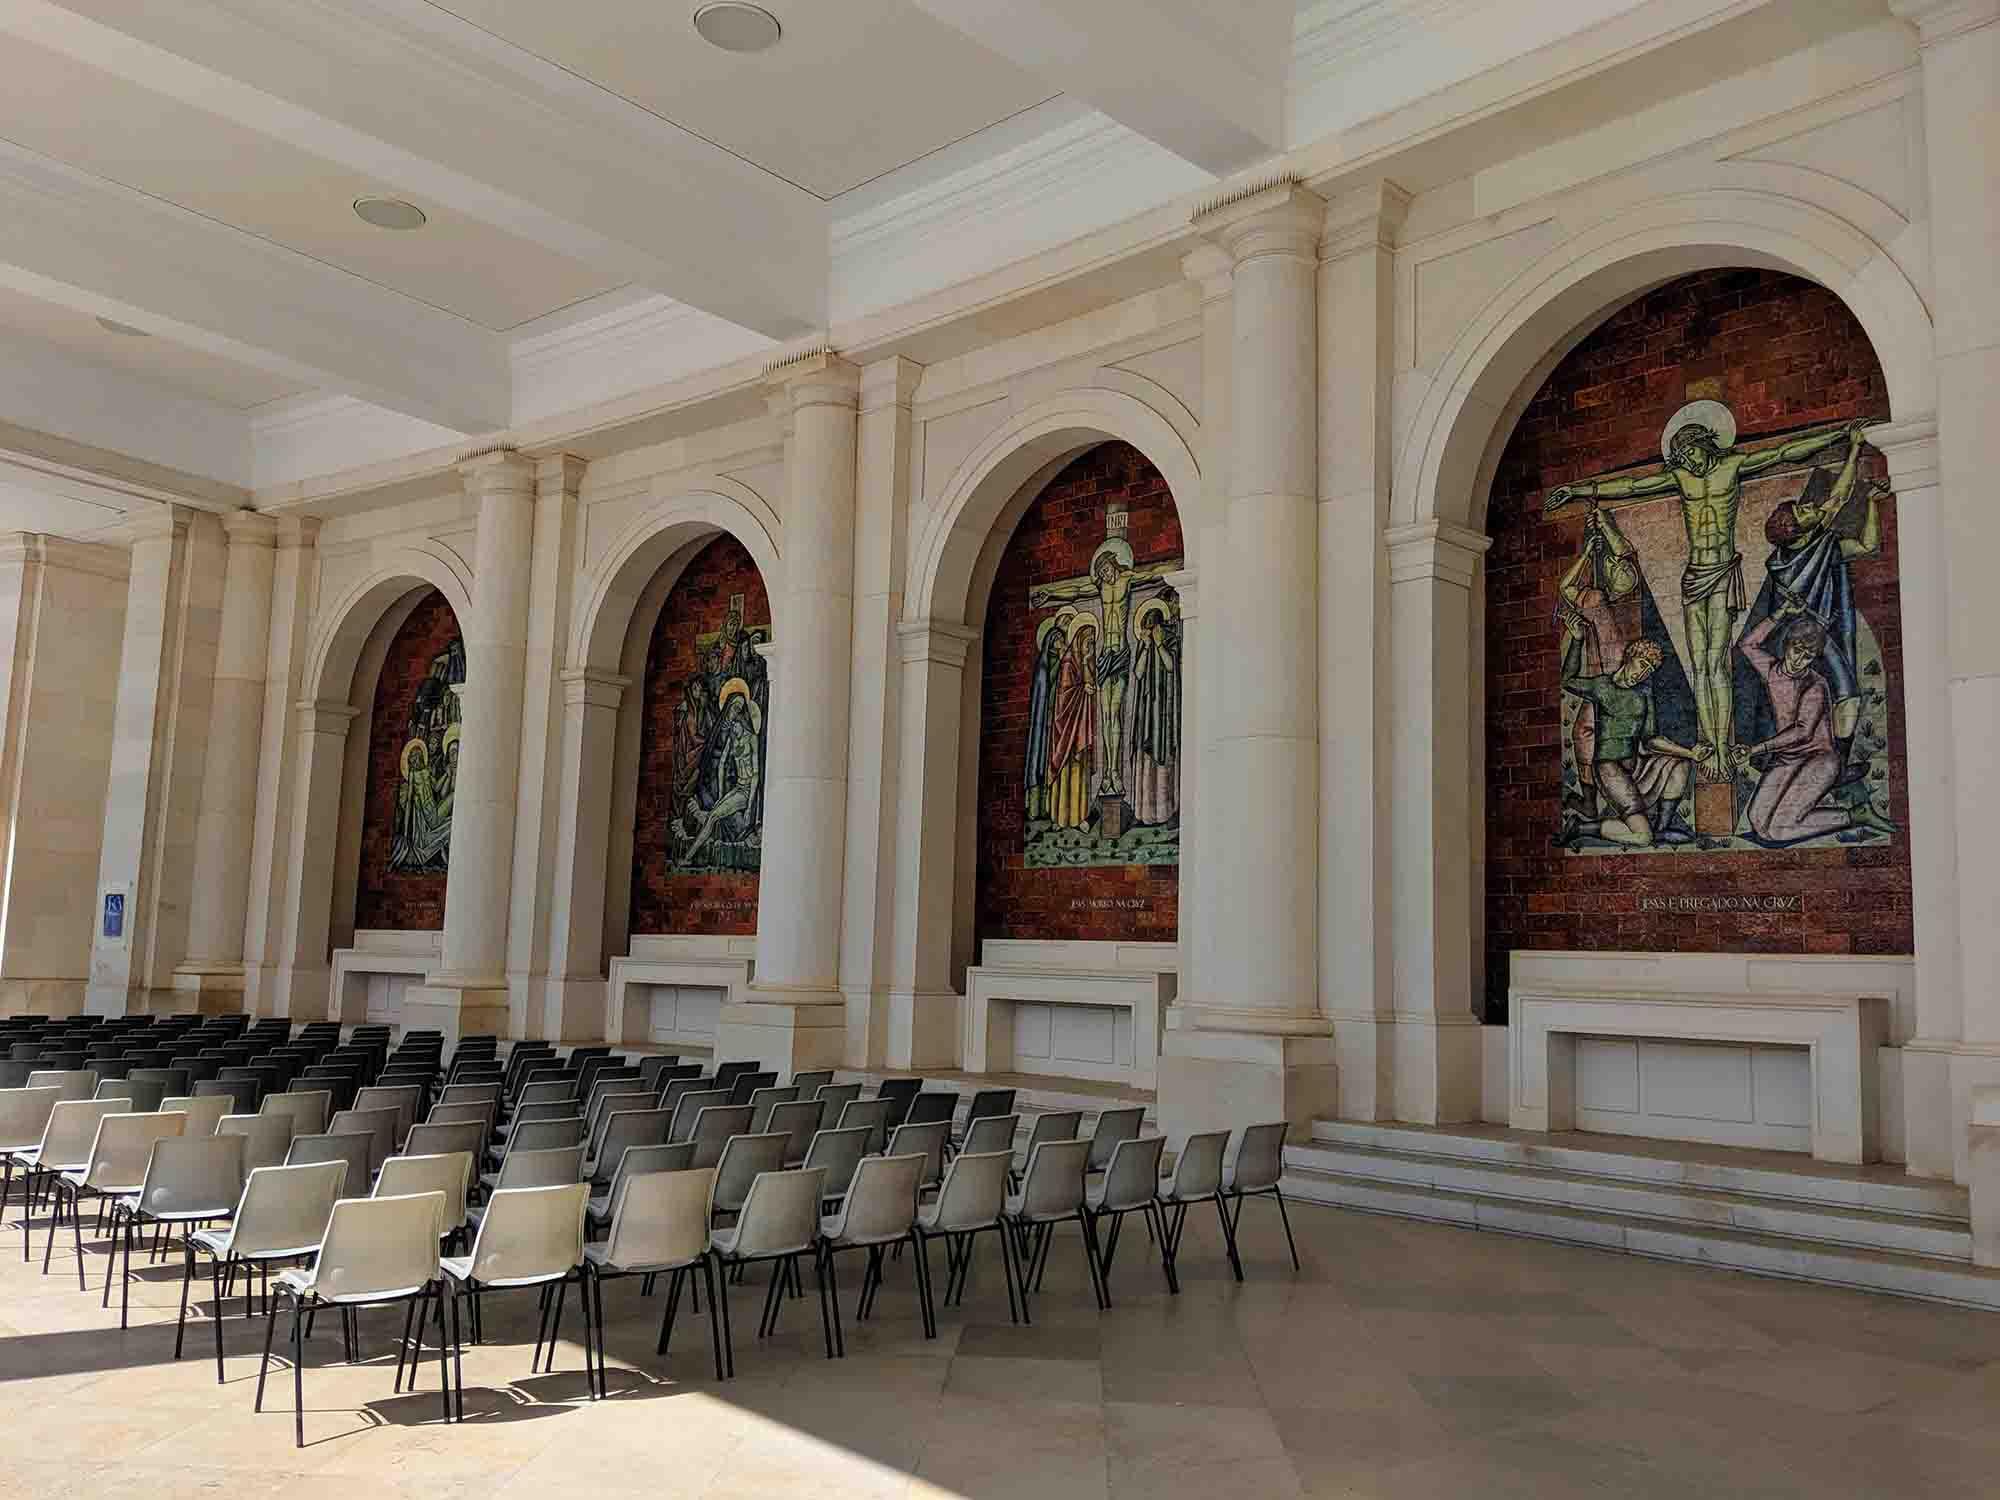 Fatima seating for mass